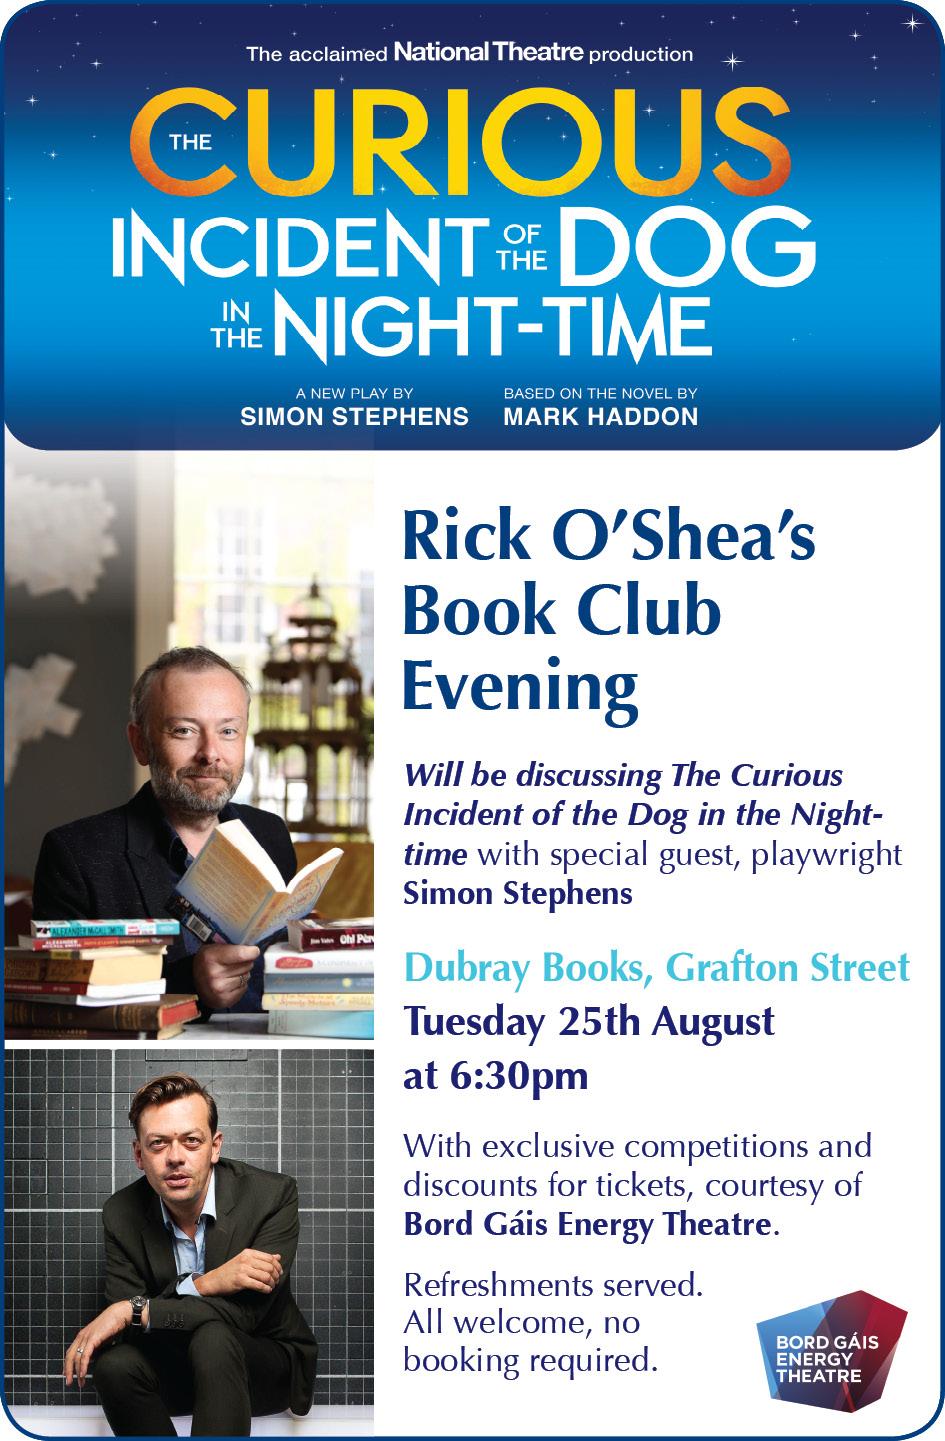 Rick O'Shea Evening